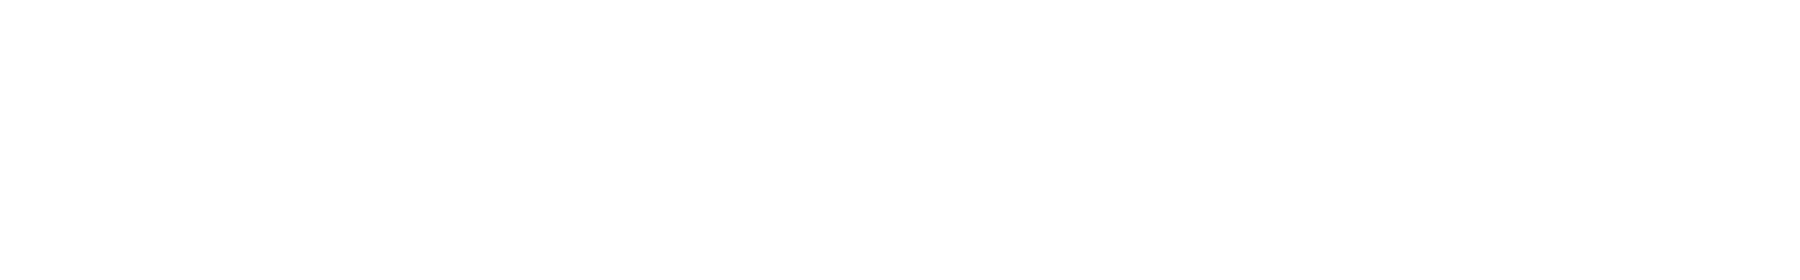 perc 1 16